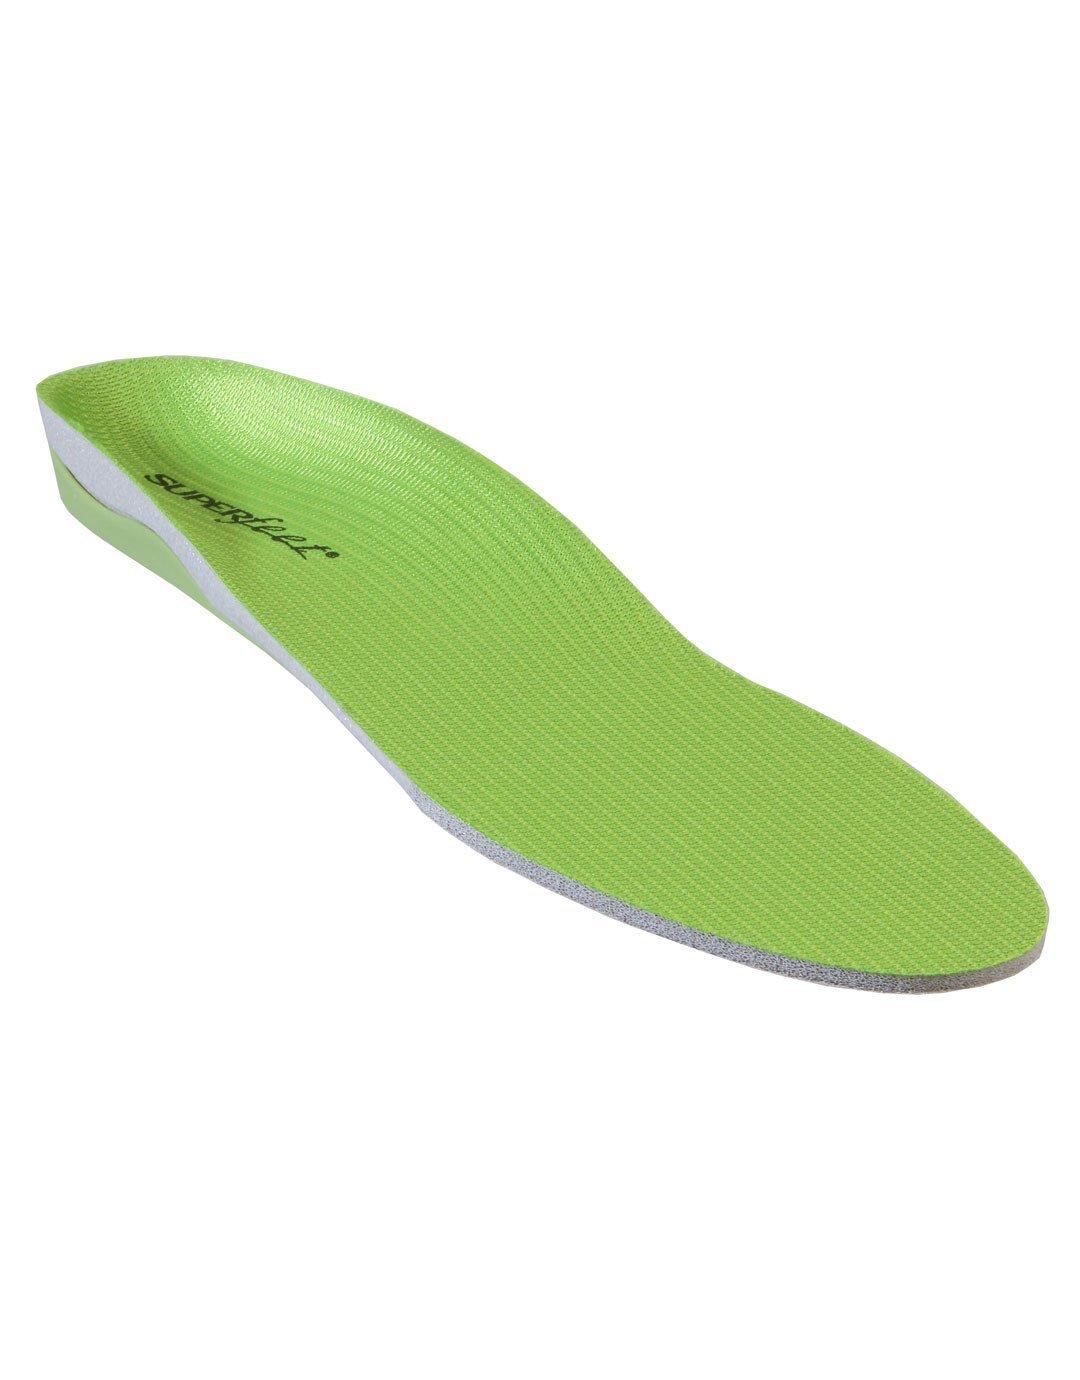 Superfeet Unisex Premium Green Green 8.5-10 Women / 7.5-9 Men  US